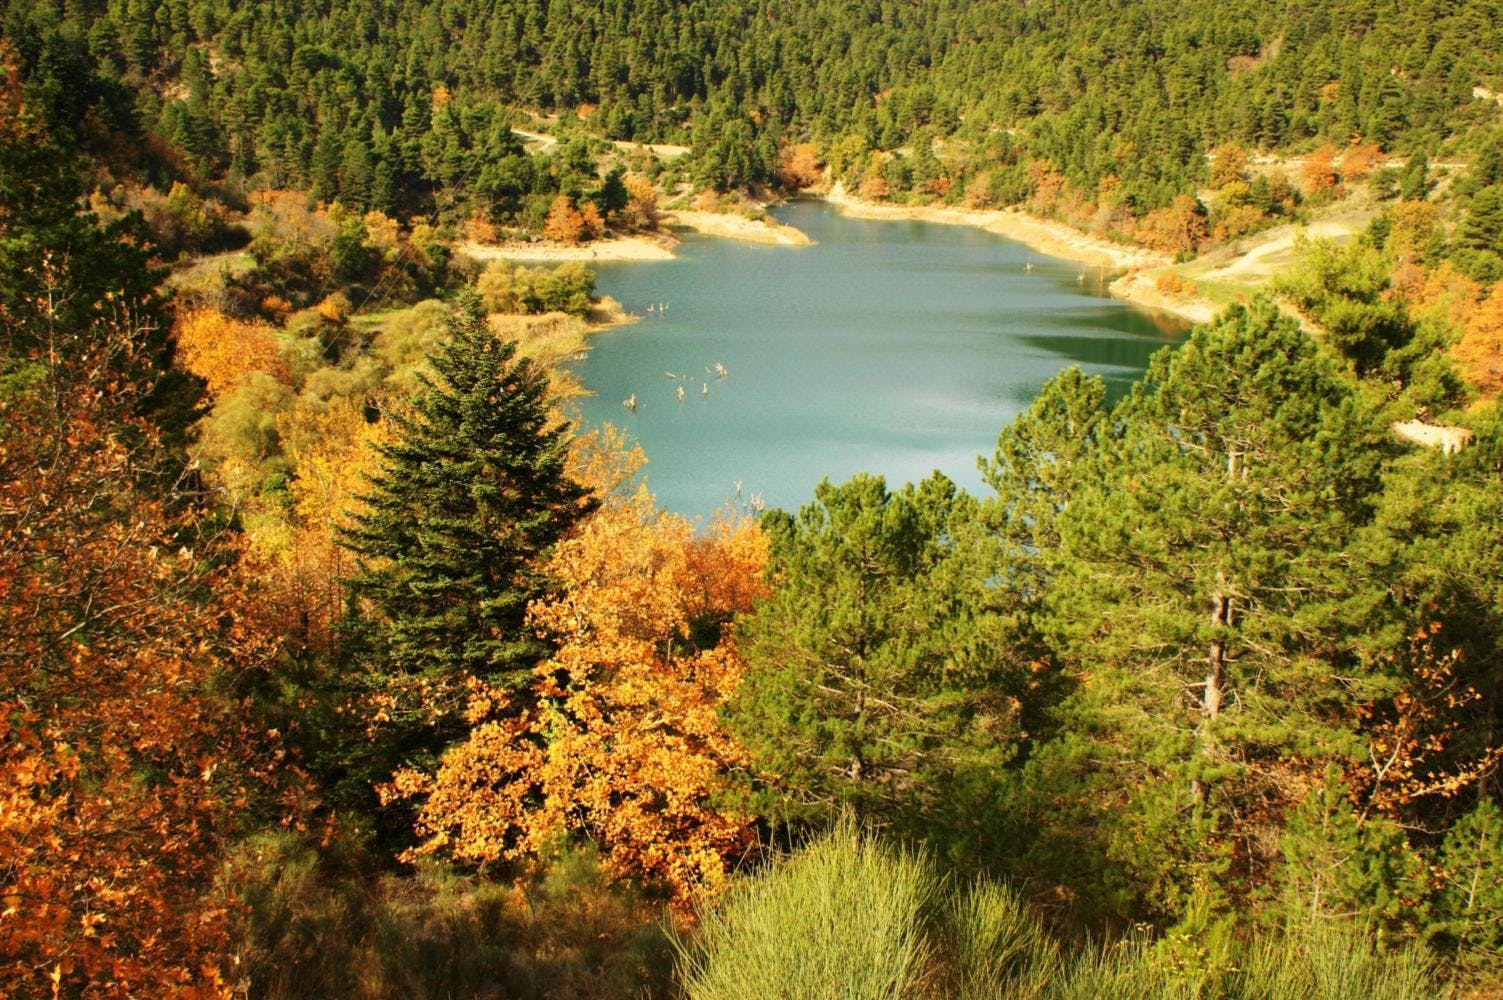 ActiveHike Λιμνη Τσιβλου Autumn Edition